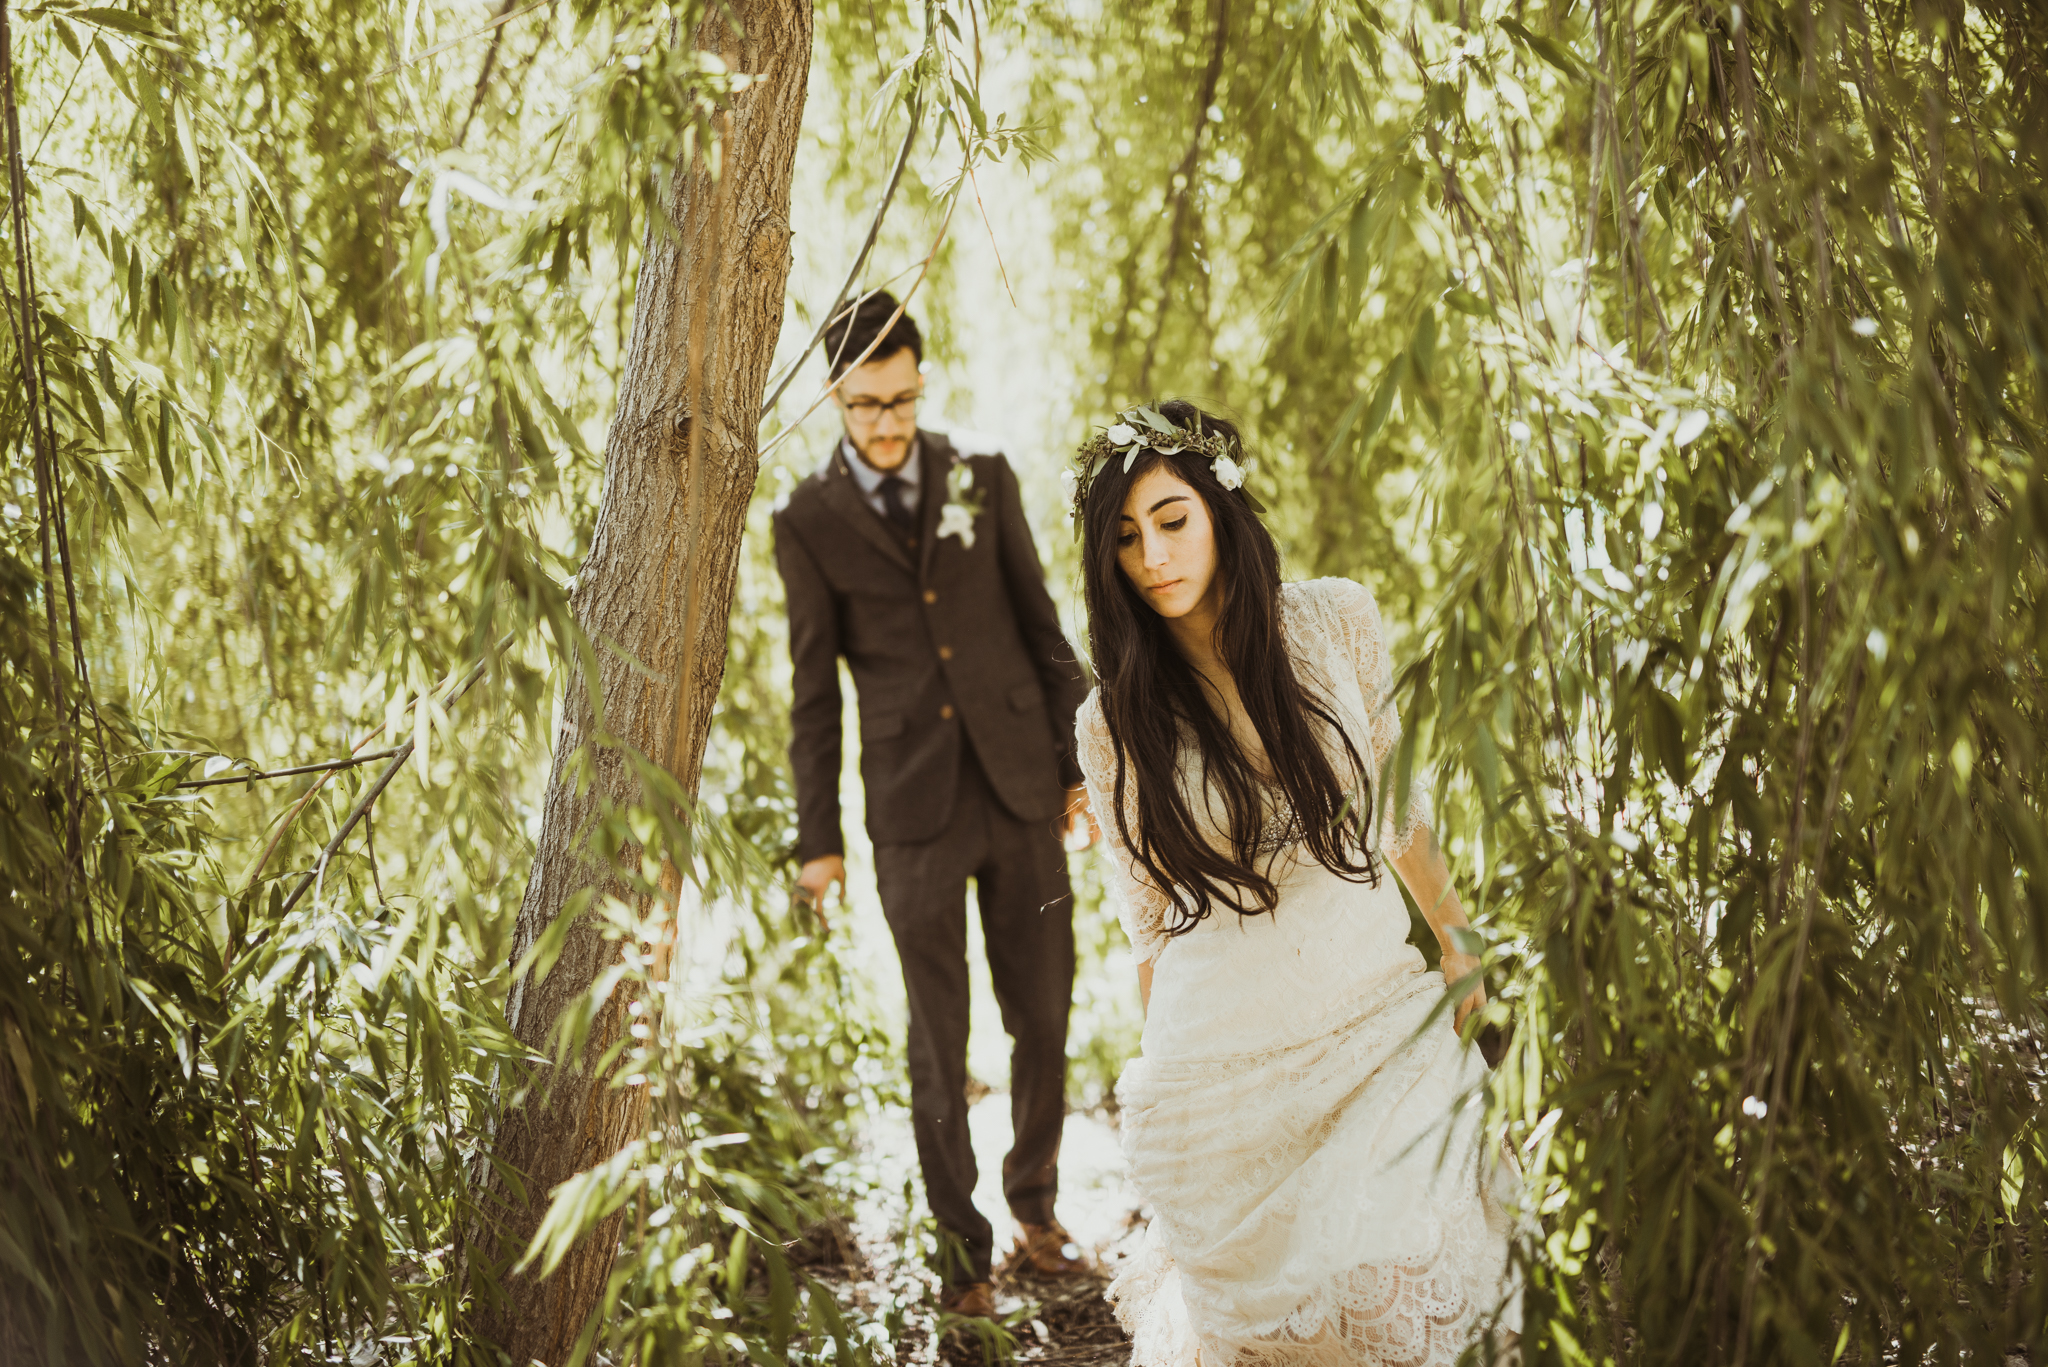 ©Isaiah-&-Taylor-Photography---Oak-Canyon-Nature-Center-Wedding,-Anaheim-Hills-069.jpg